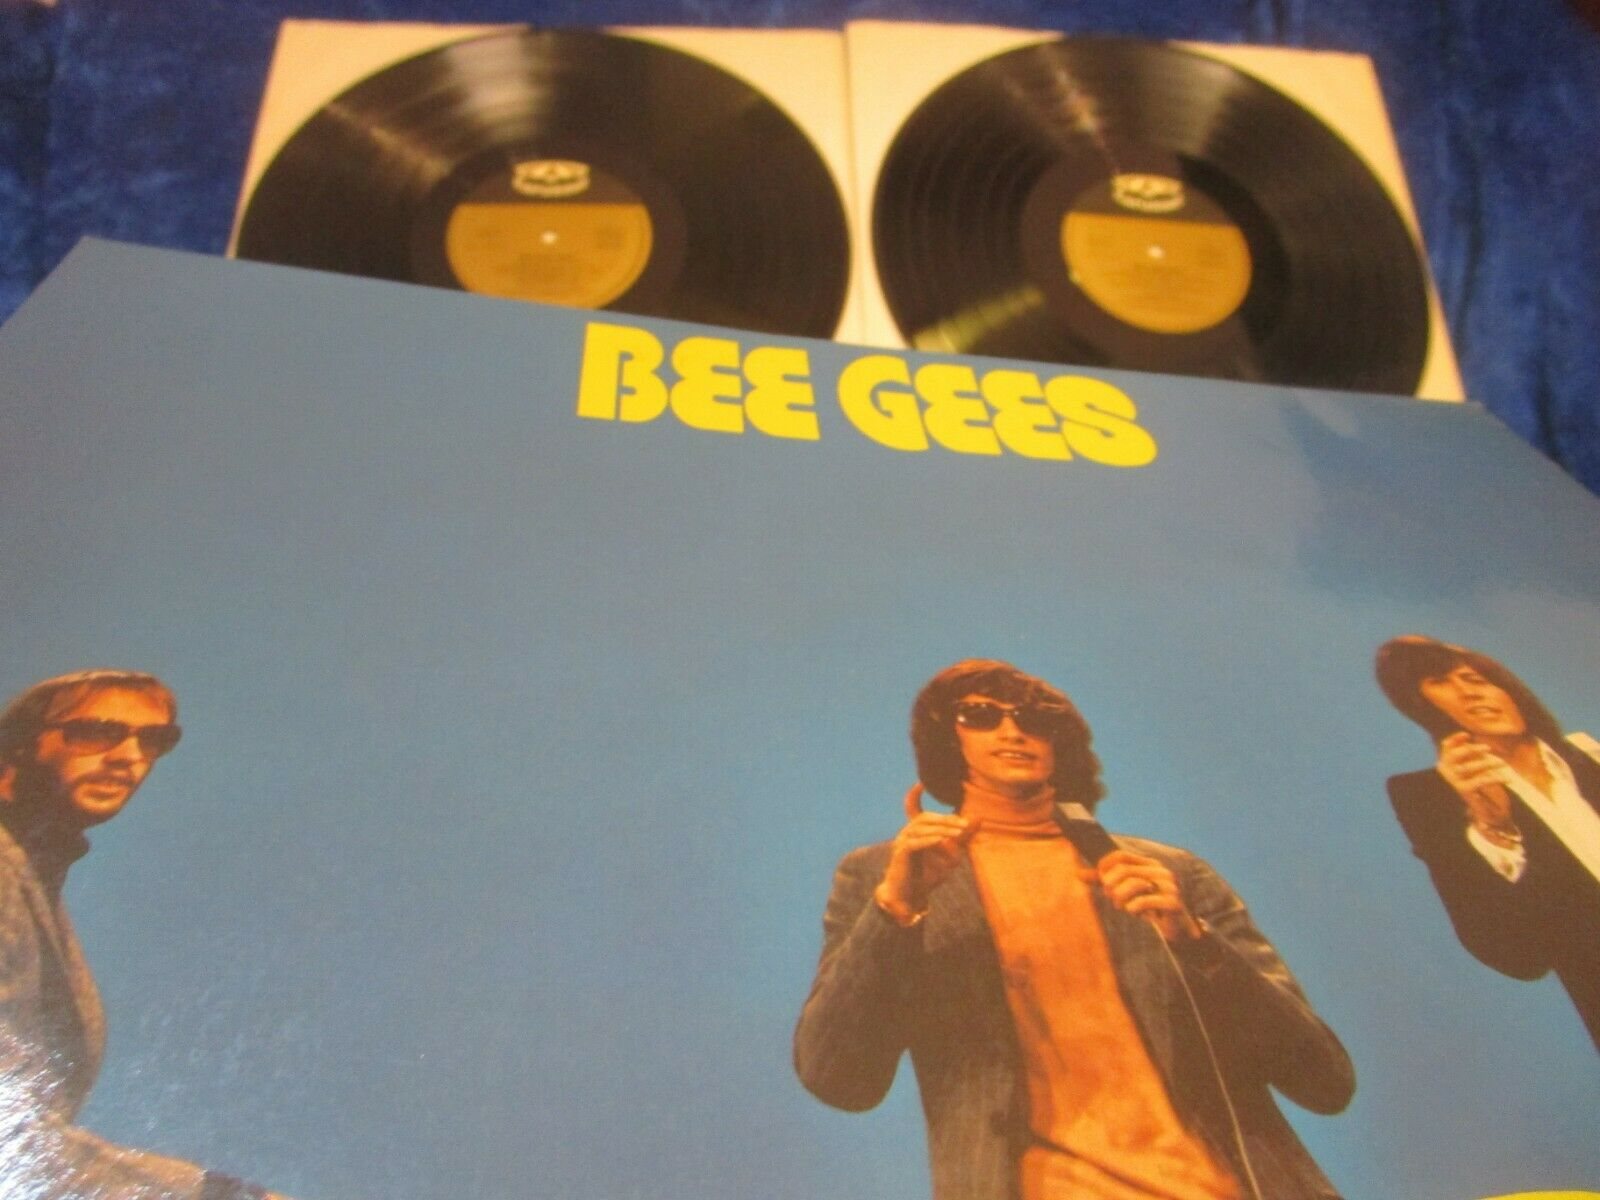 BEE GEES ★★ BEE GEES BEST ★★ TOP CONDITION GERMAN 1st PRESS